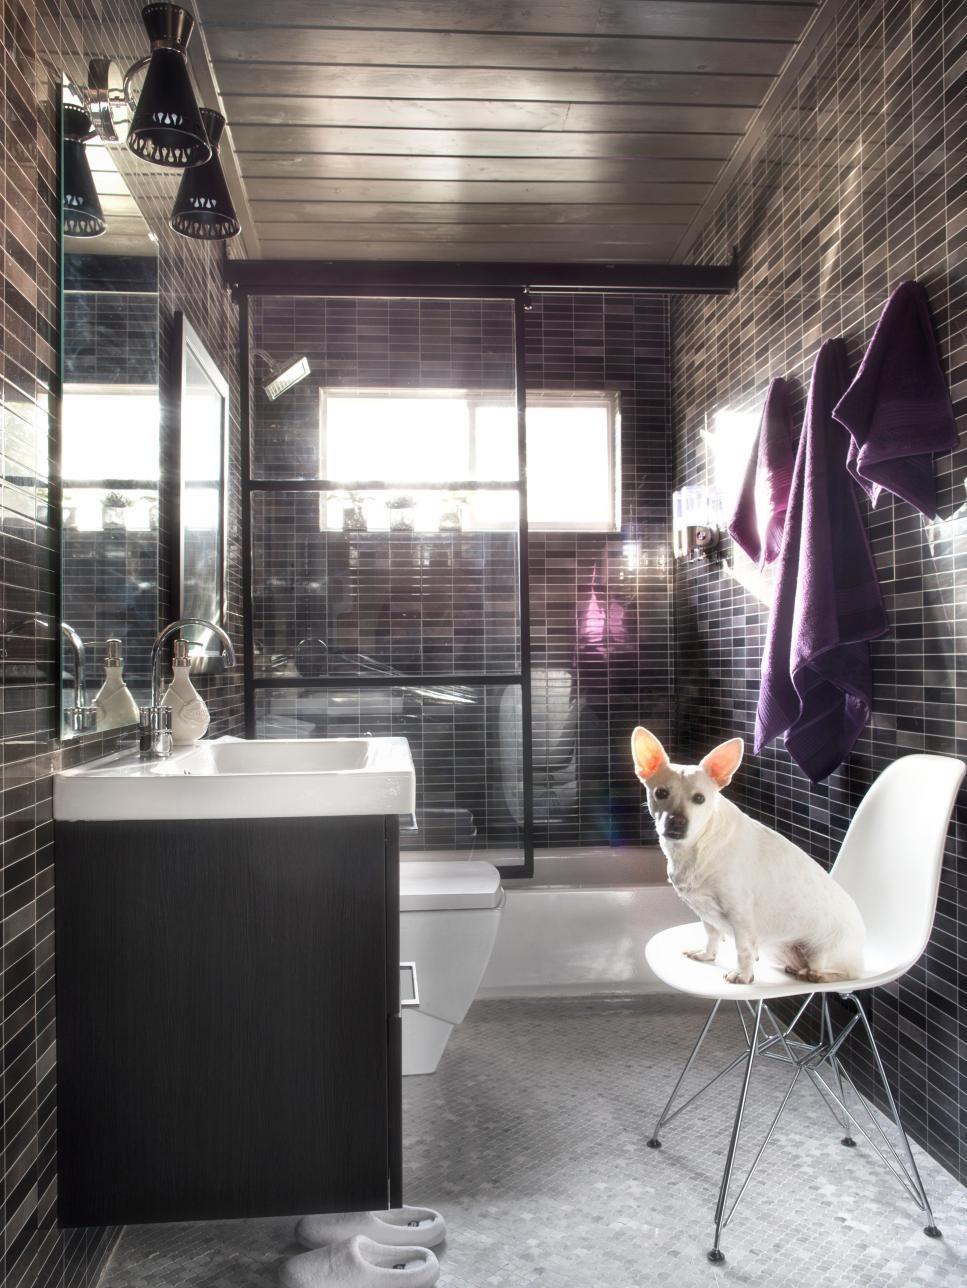 Kl Bathroom Makeovers new bathroom designs - personalised bathroom designs in sydney